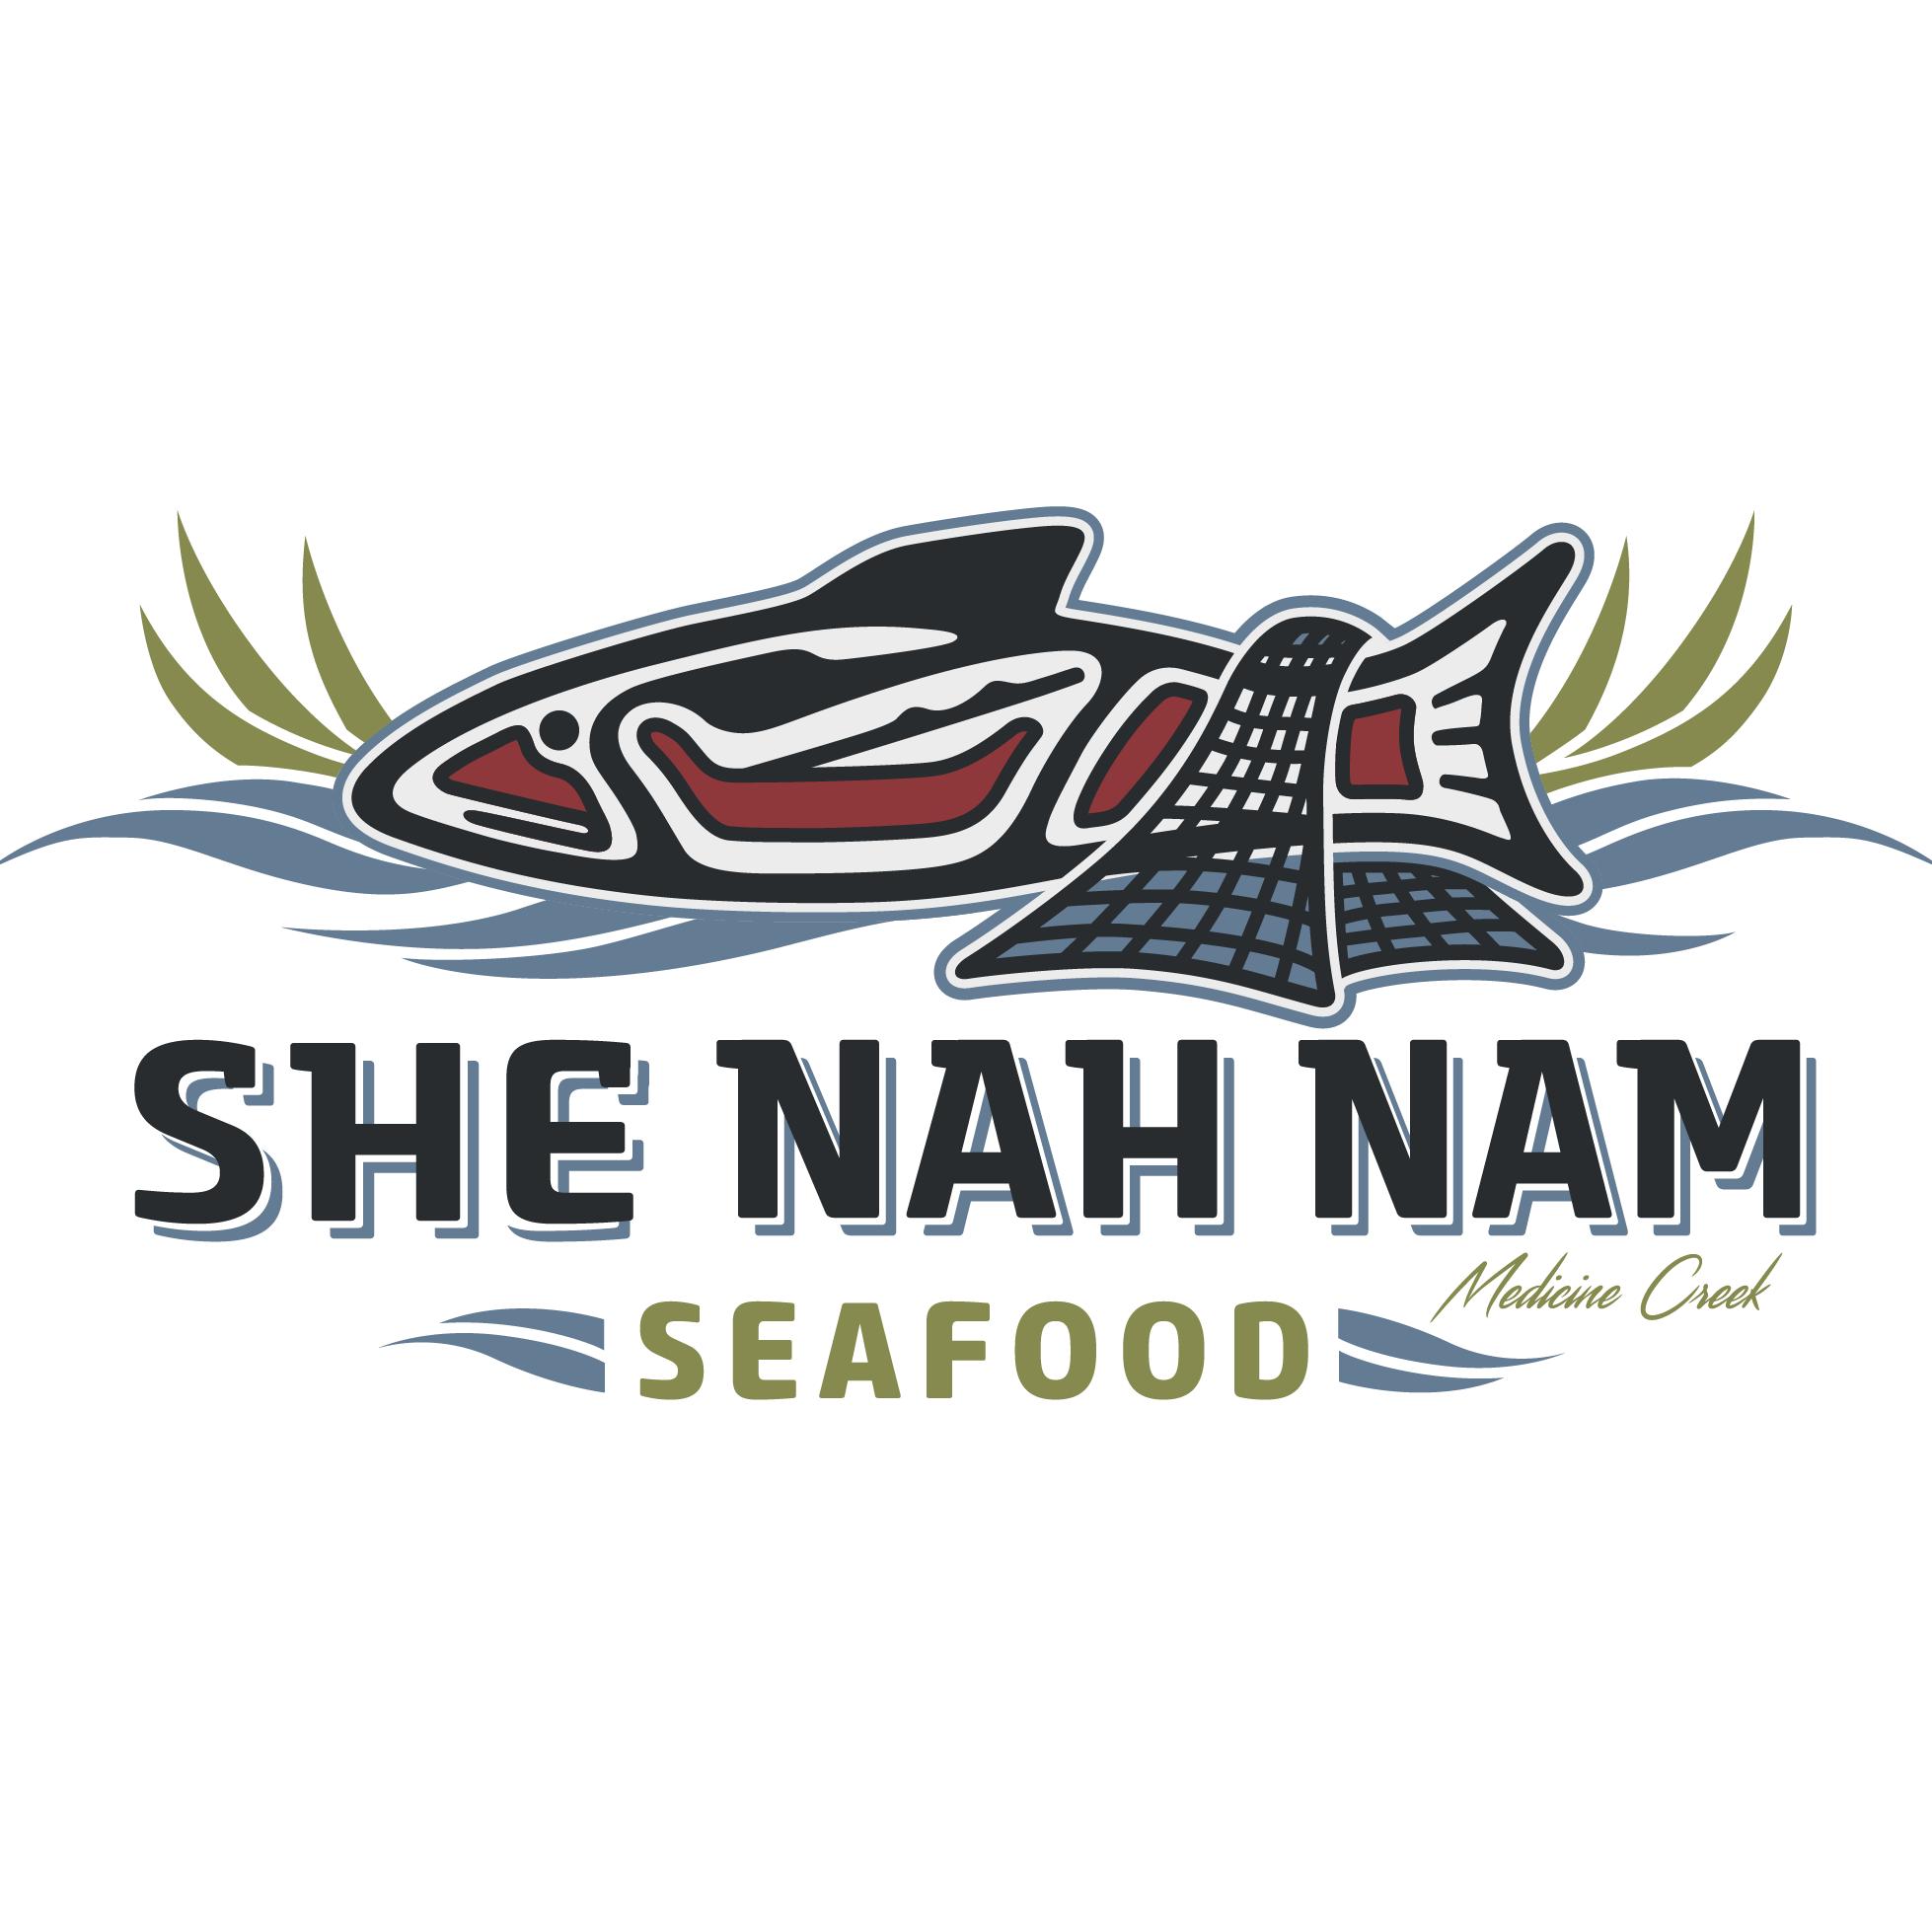 She Nah Nam Seafood Market - Olympia, WA 98513 - (360)359-7553 | ShowMeLocal.com